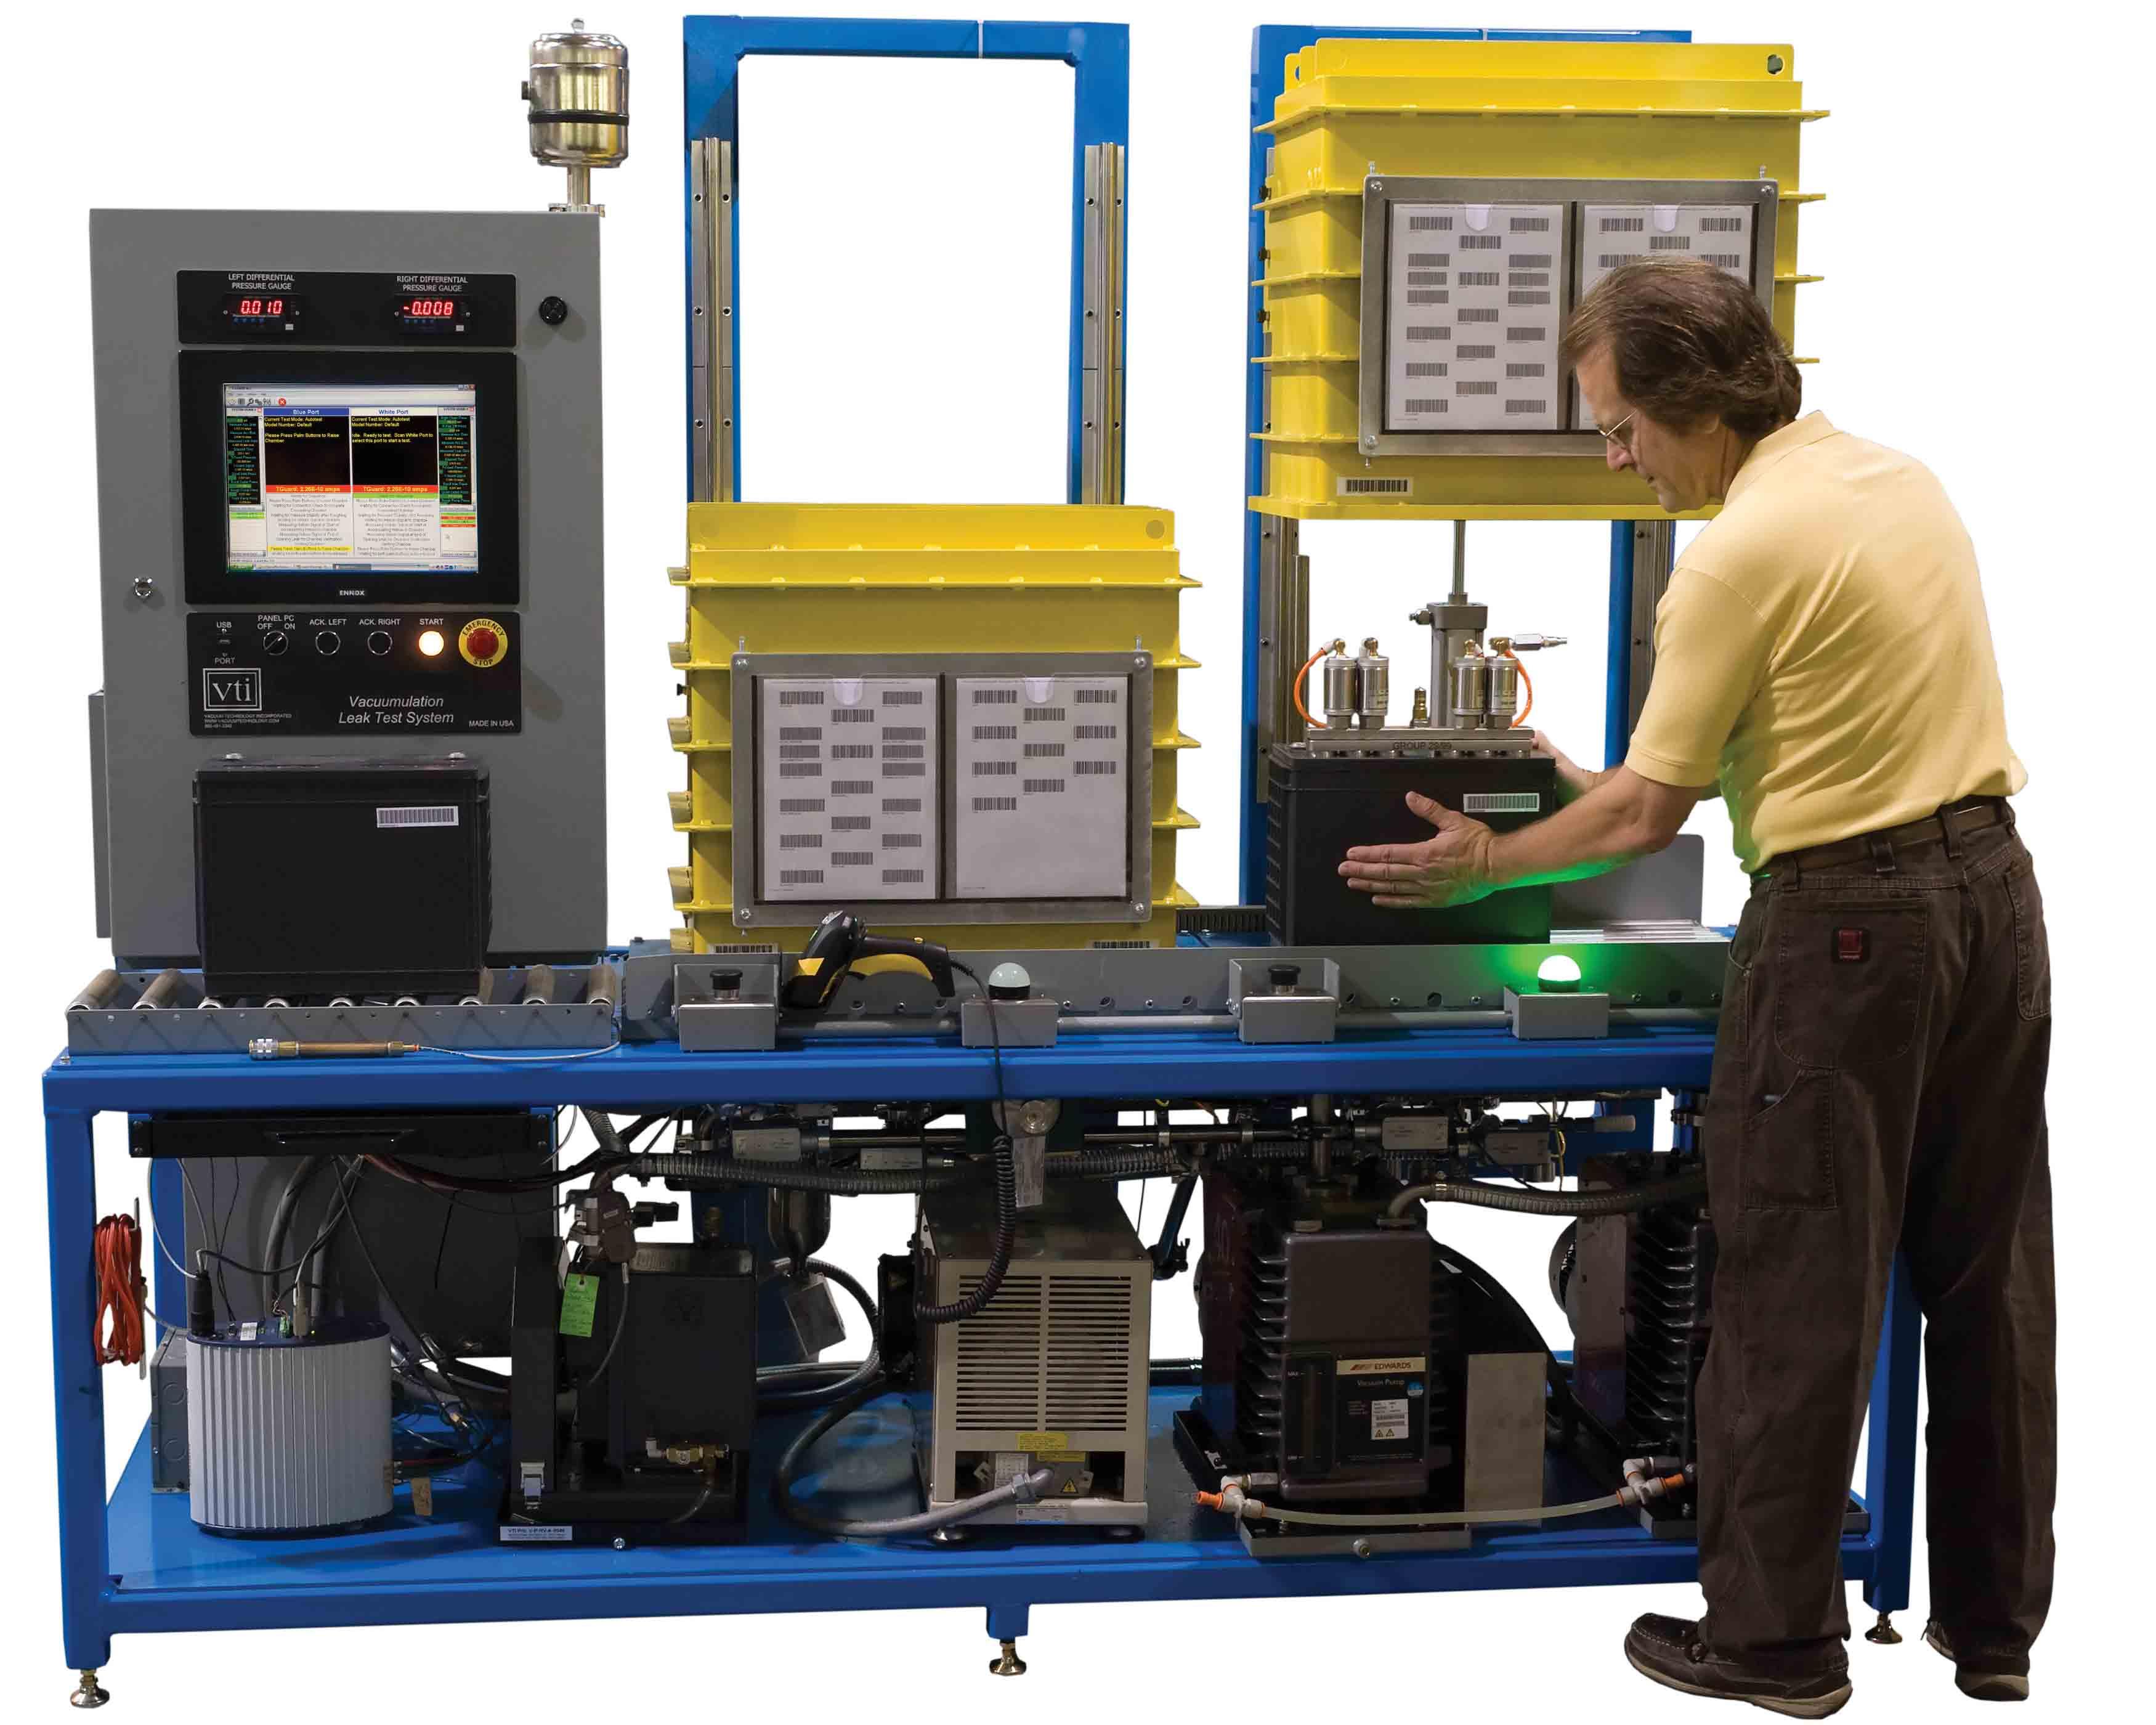 VTI's 12 Volt Battery with VTI Vacuumulation Helium Leak Test System